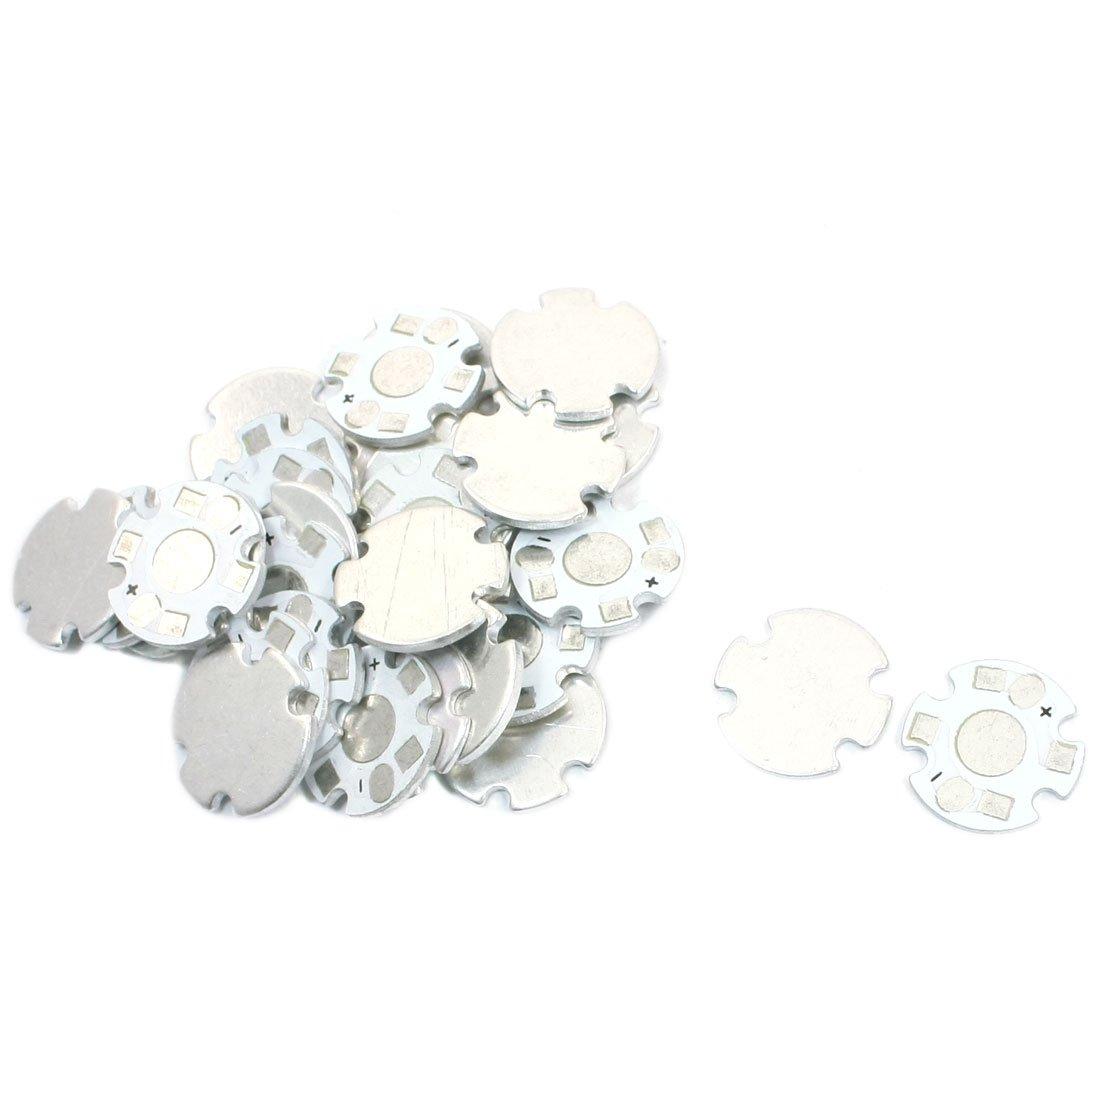 30 Stü ck Aluminium Teller DIY PCB 16 mm Dia fü r 1 x 1 W/3 W High Power LED Sourcingmap a14050700ux0197